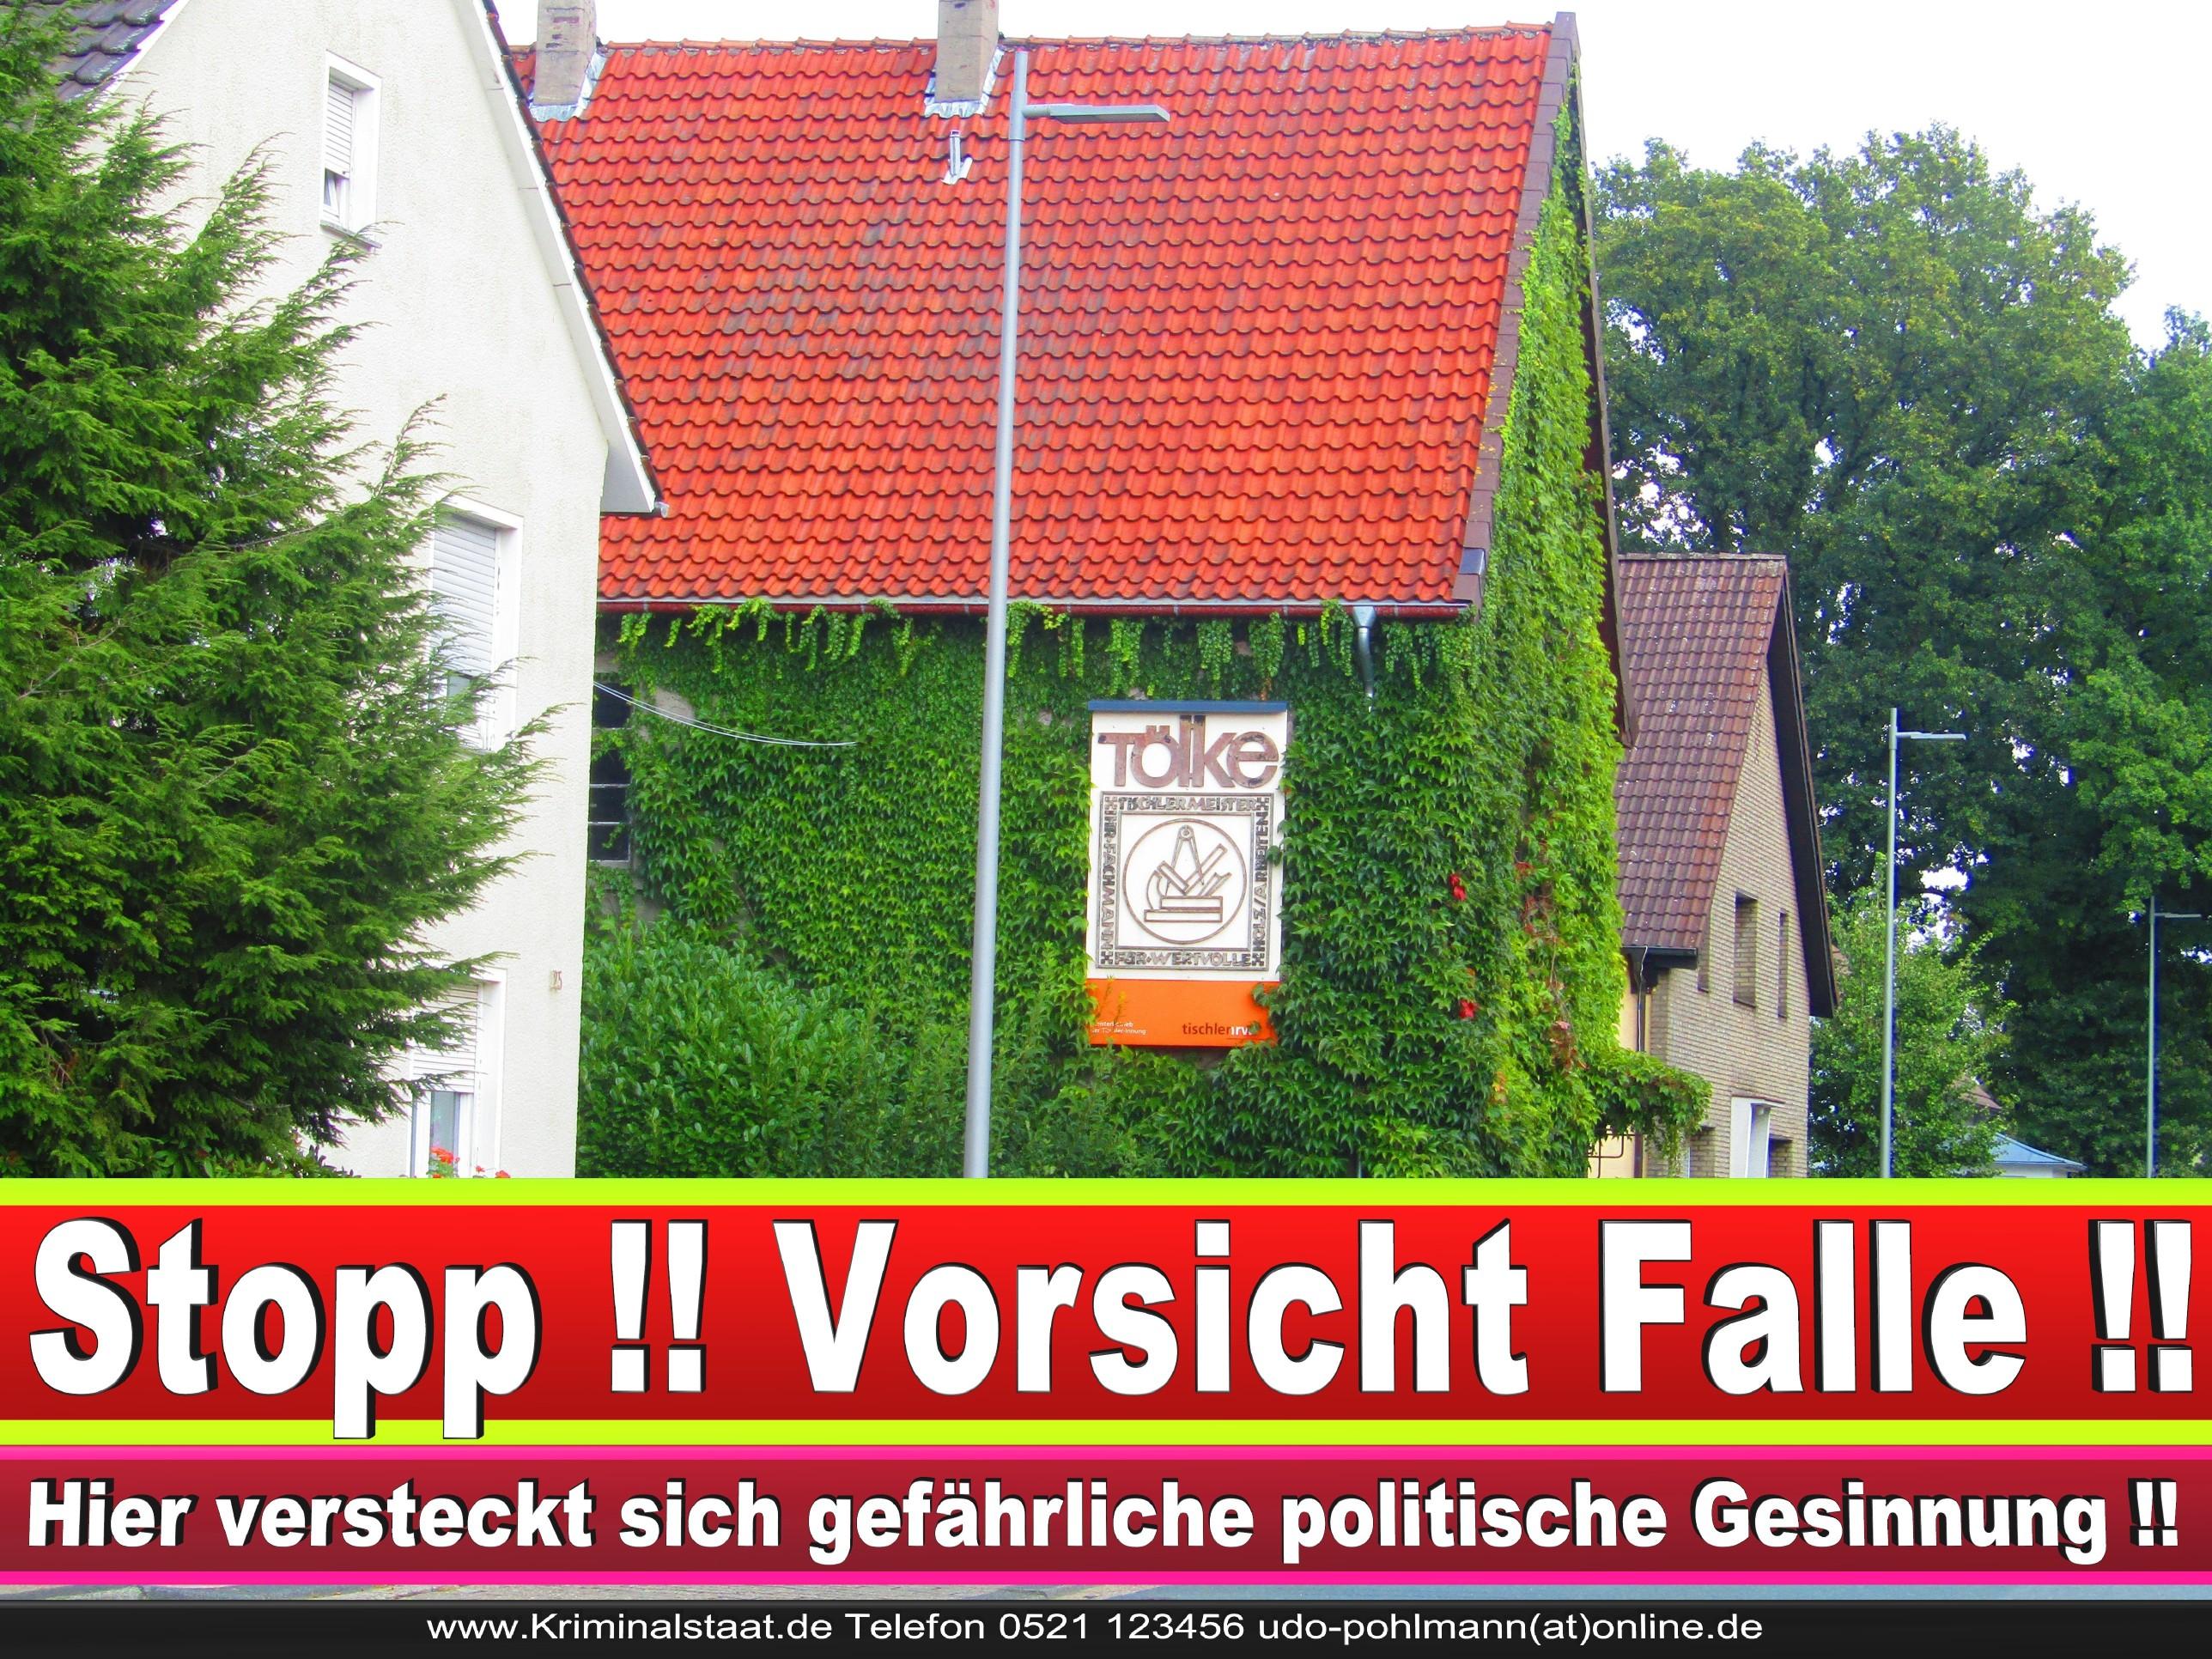 TISCHLEREI TOELKE CDU BIELEFELD TÖLKE 7 LANDTAGSWAHL BUNDESTAGSWAHL BÜRGERMEISTERWAHL